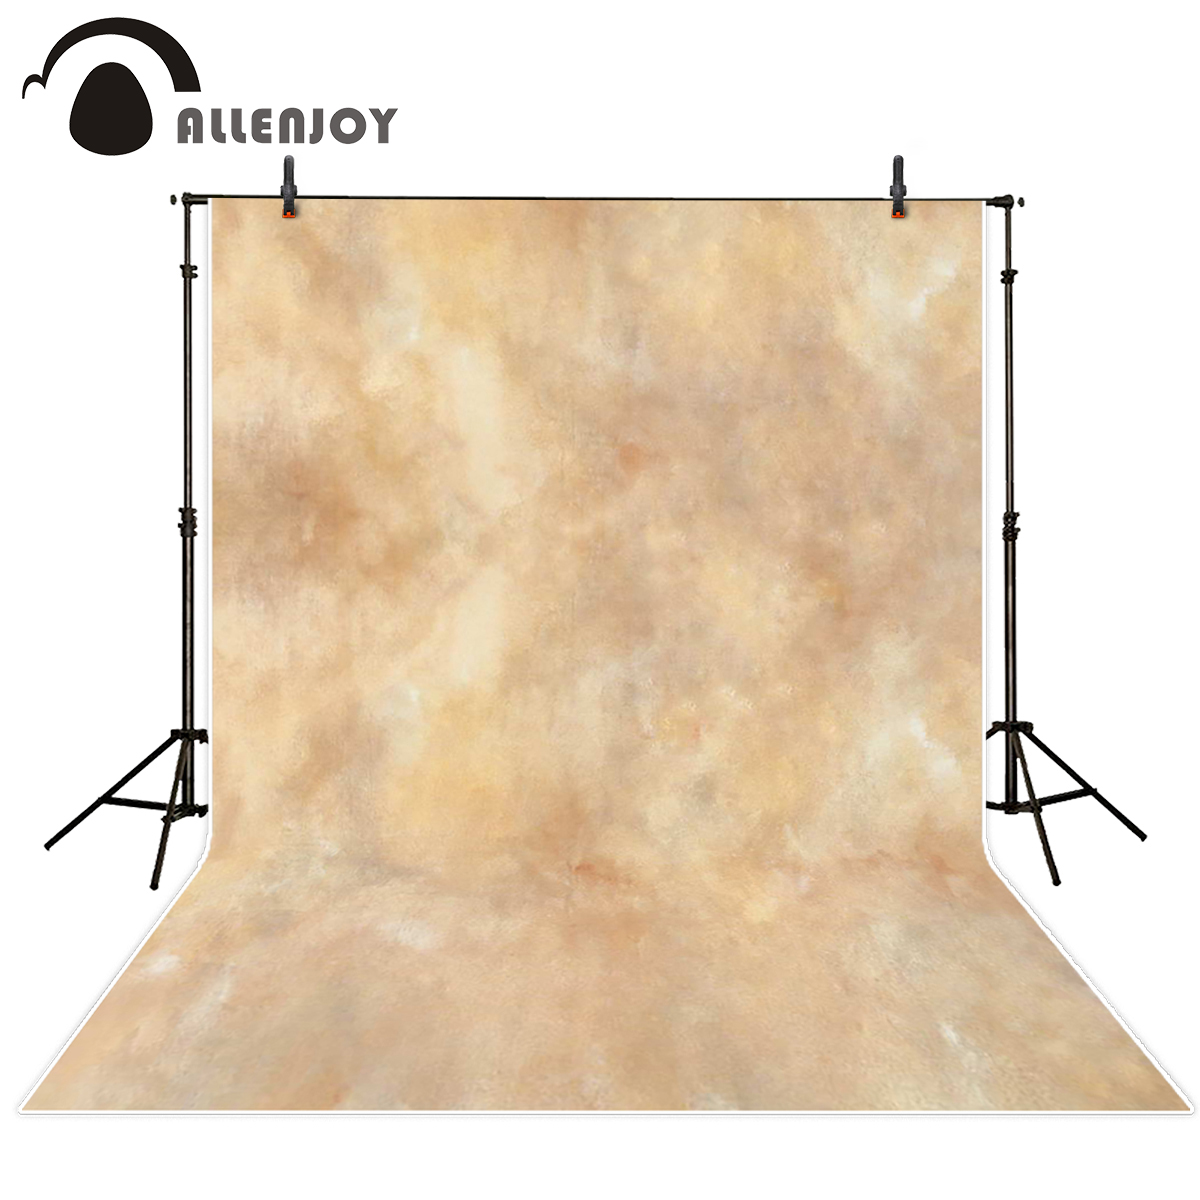 Allenjoy photography backdrops dark pure color muslin background photography backgrounds for photo studio 200*300cm цена